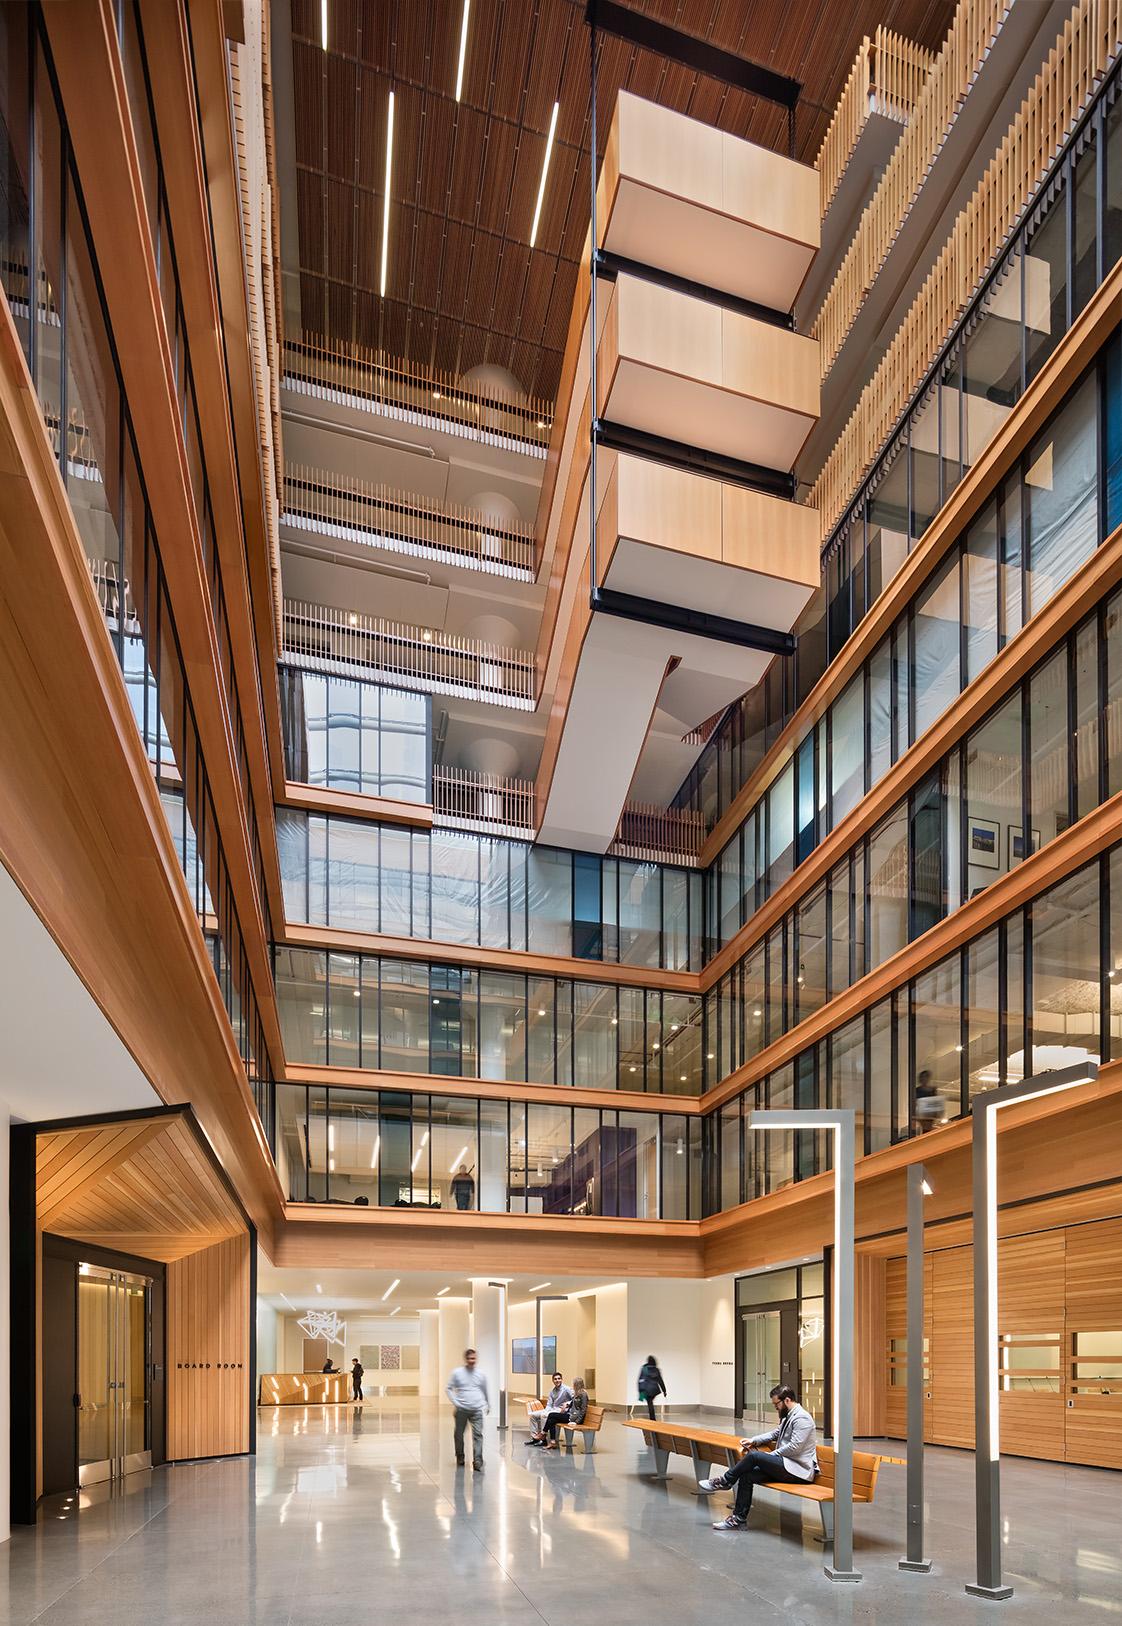 Bay Area Metro Center Seven-Story Atrium with Repurposed Wood Paneling